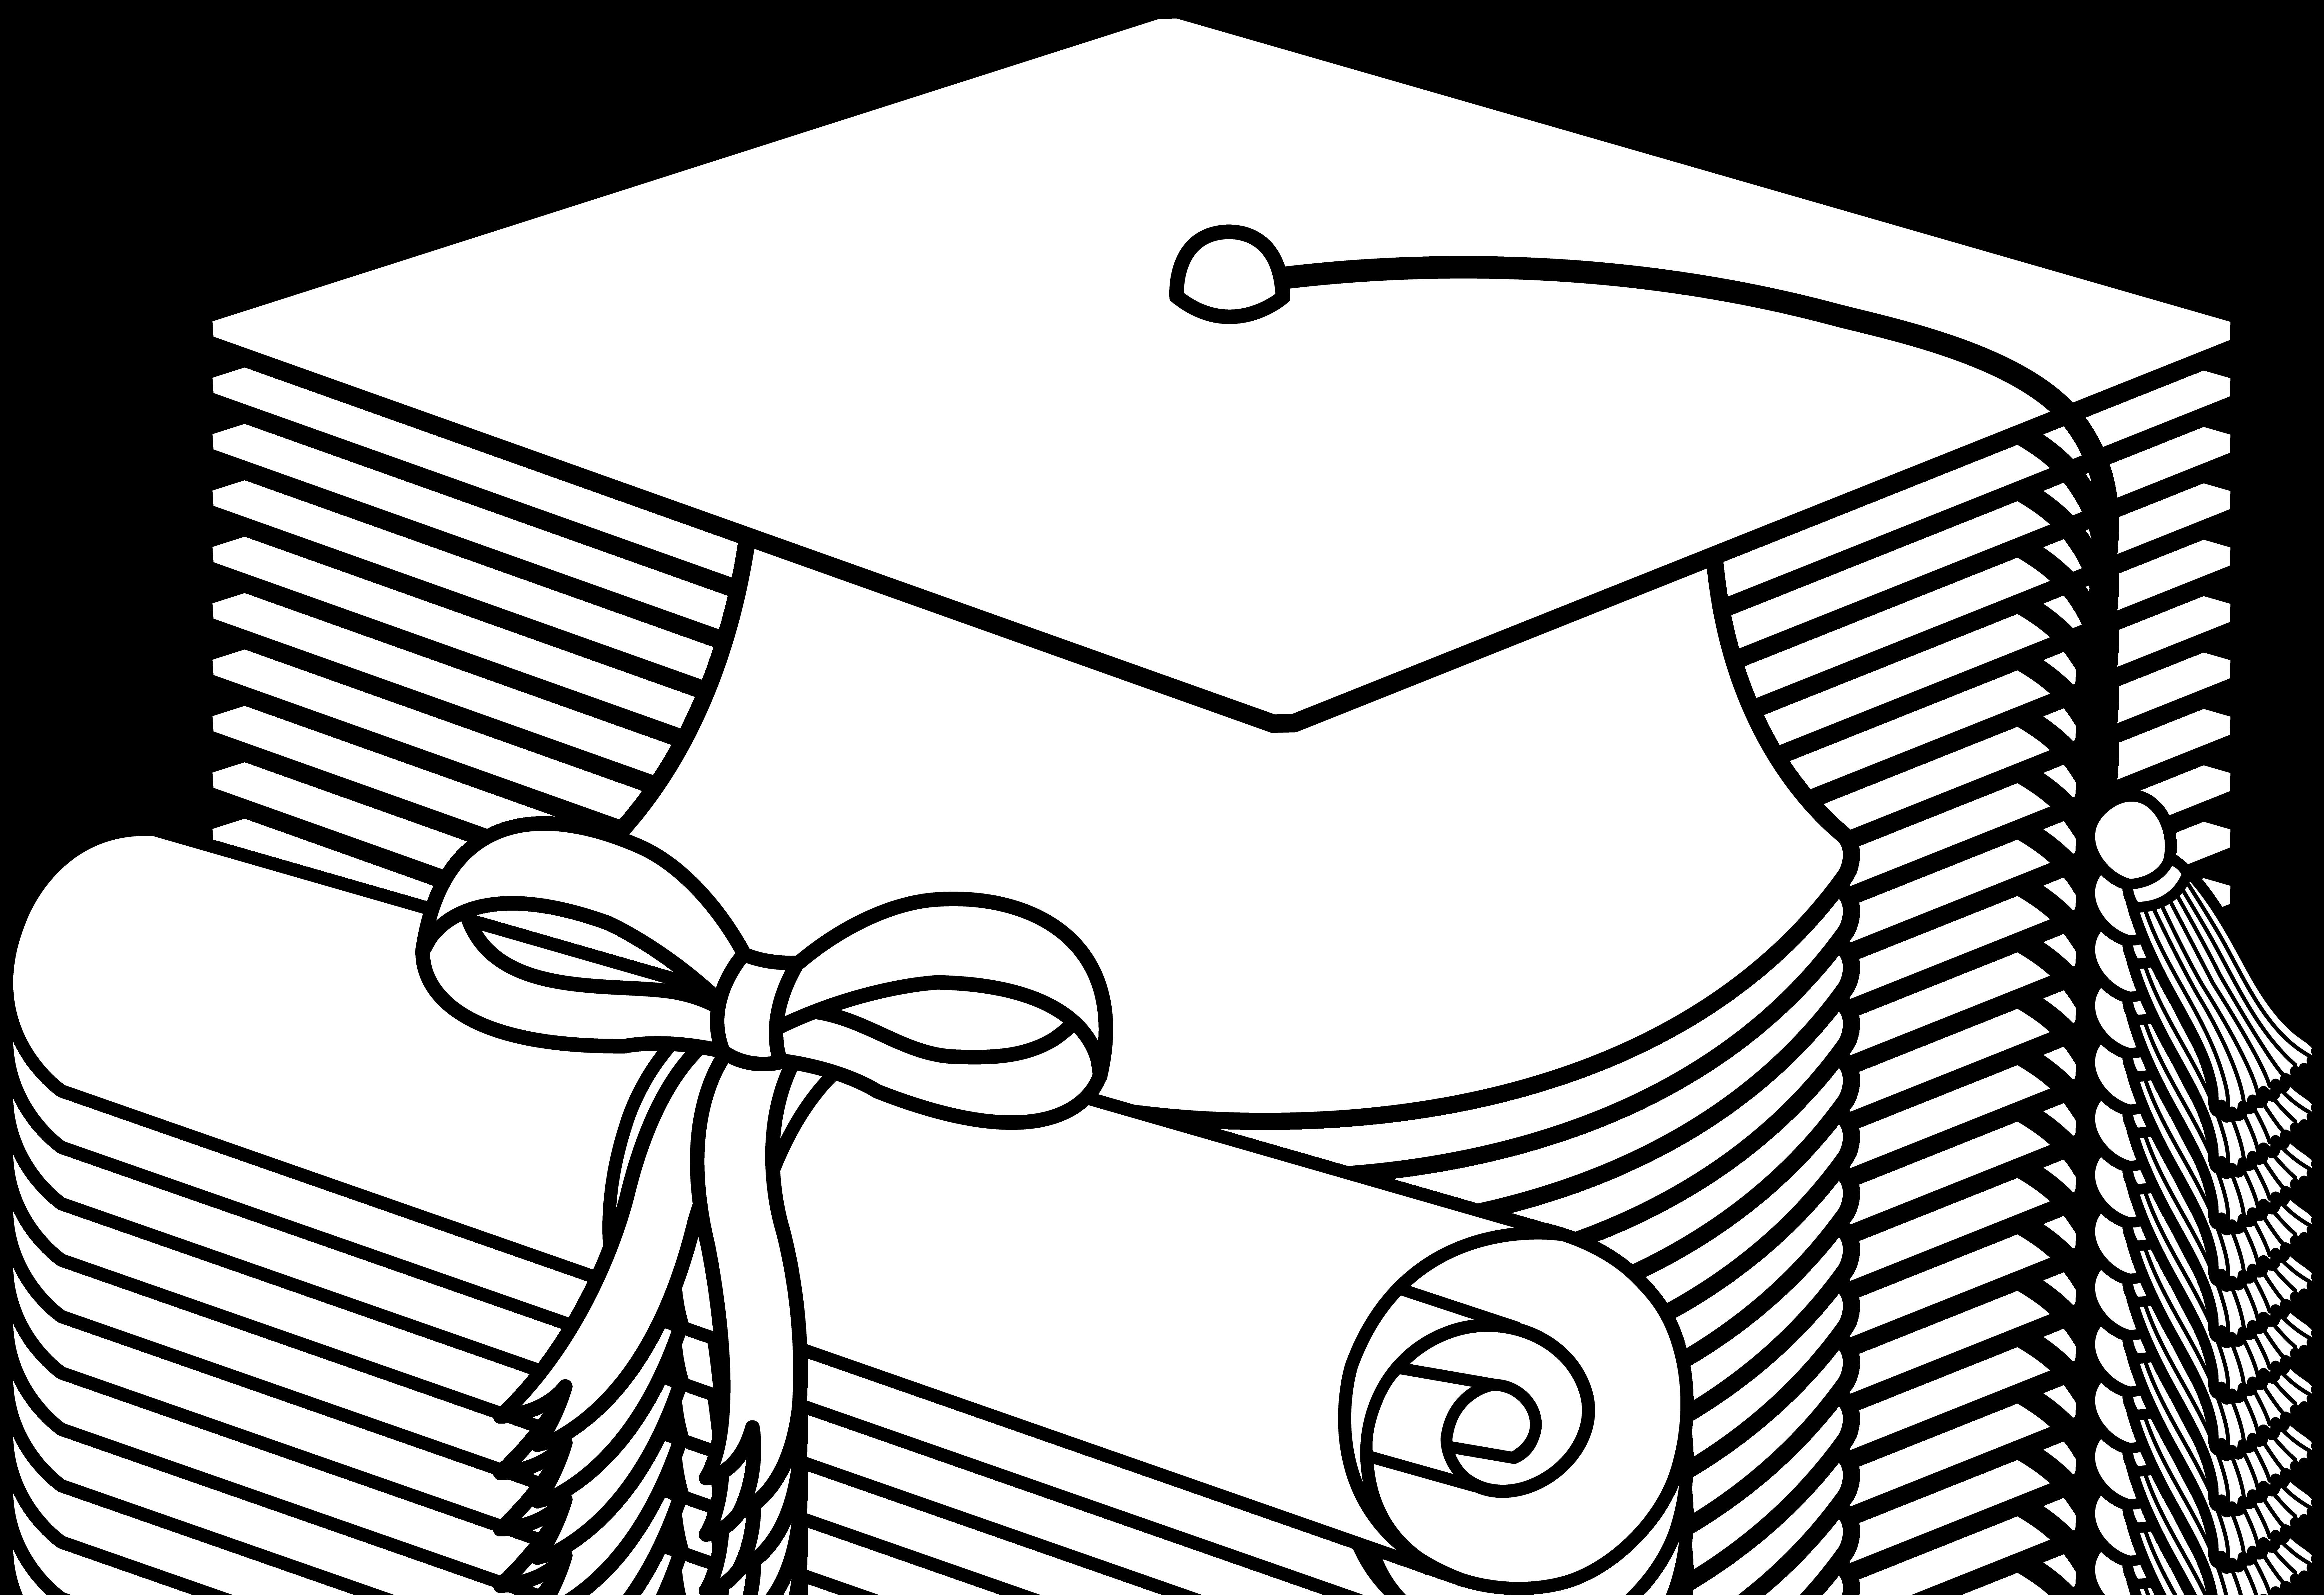 Flying Graduation Caps Clip Art - Graduation Cap PNG Black And White